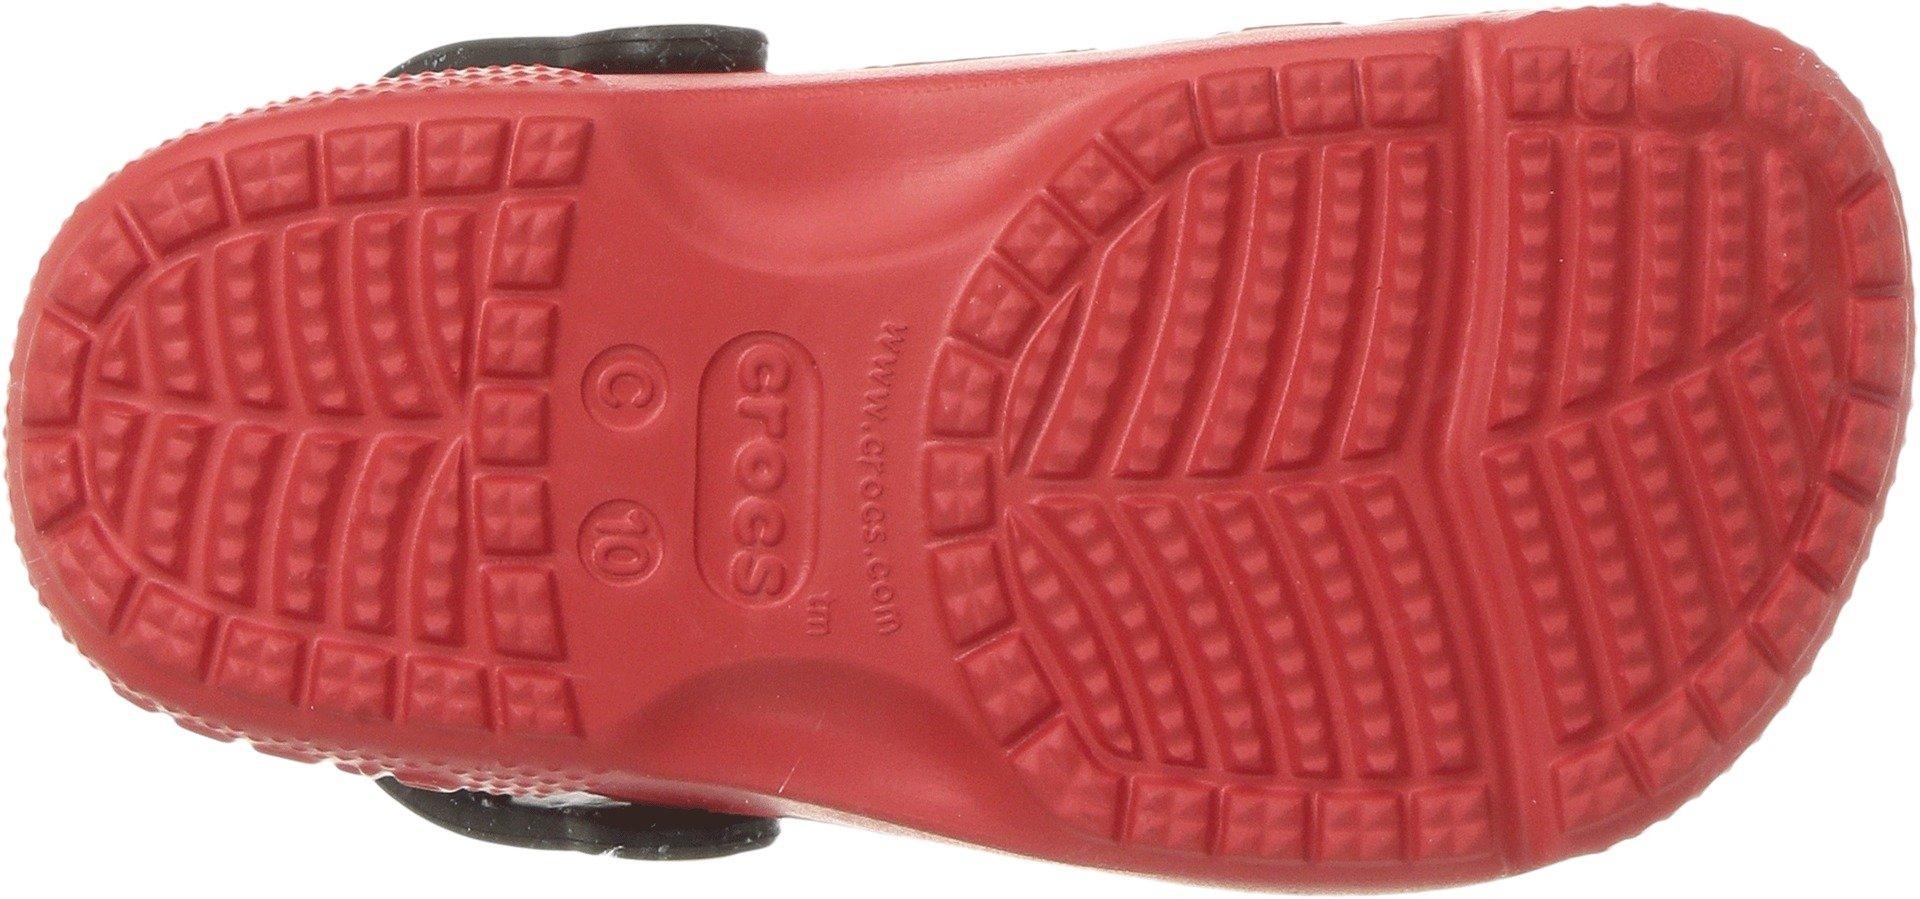 Crocs Girls' Fun Lab Minnie Clog, Flame, 8 M US Toddler by Crocs (Image #3)